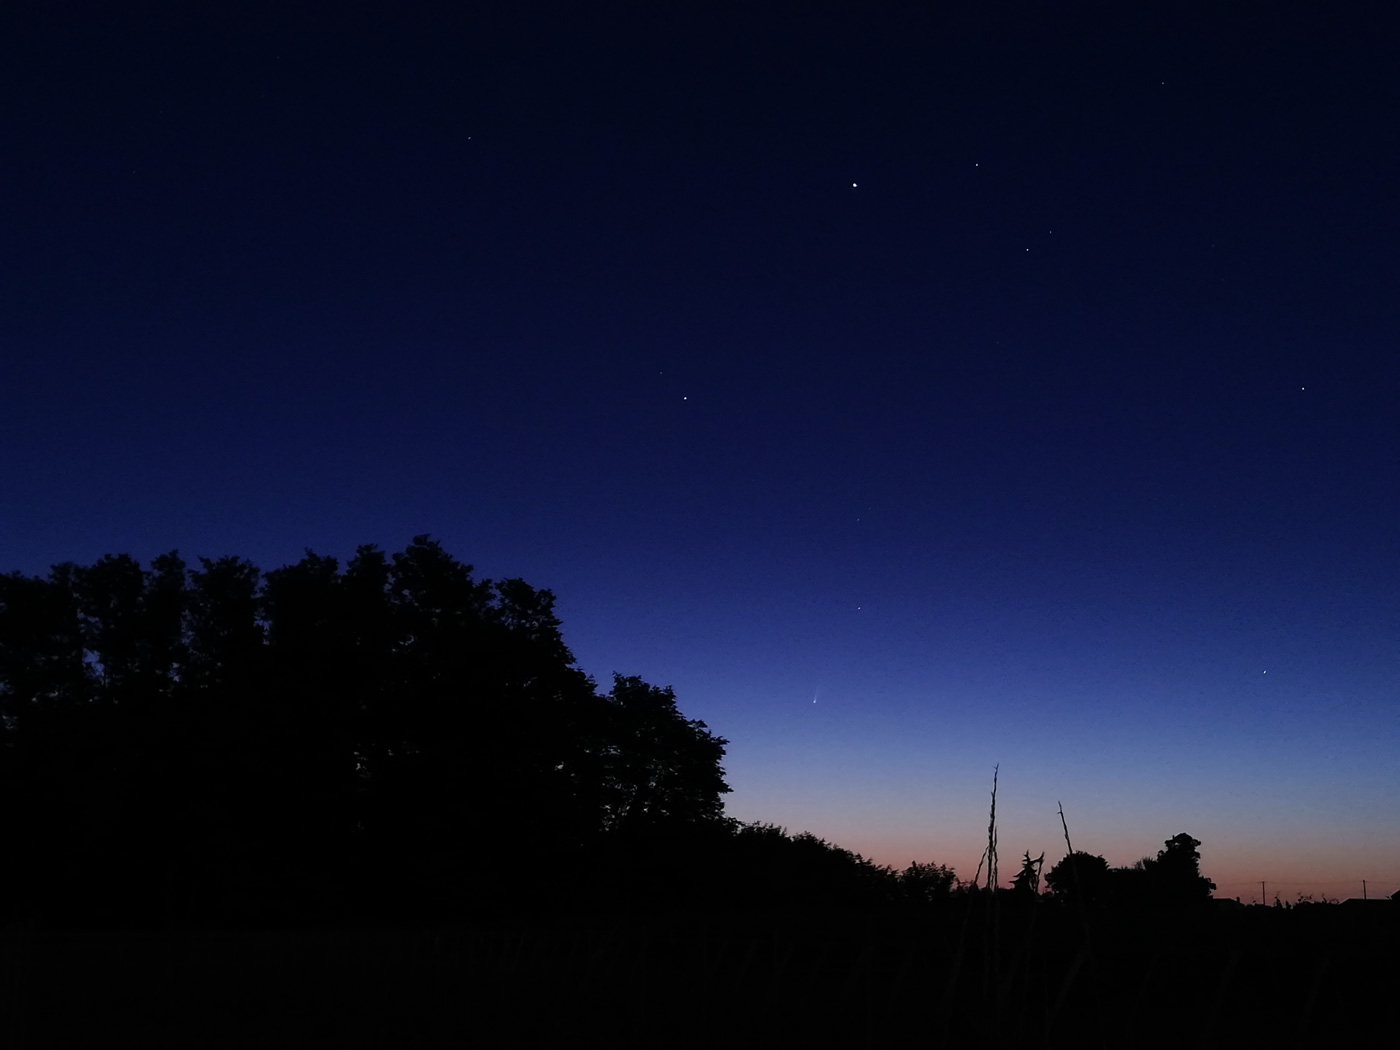 Comète C/2020 F3 NEOWISE F3